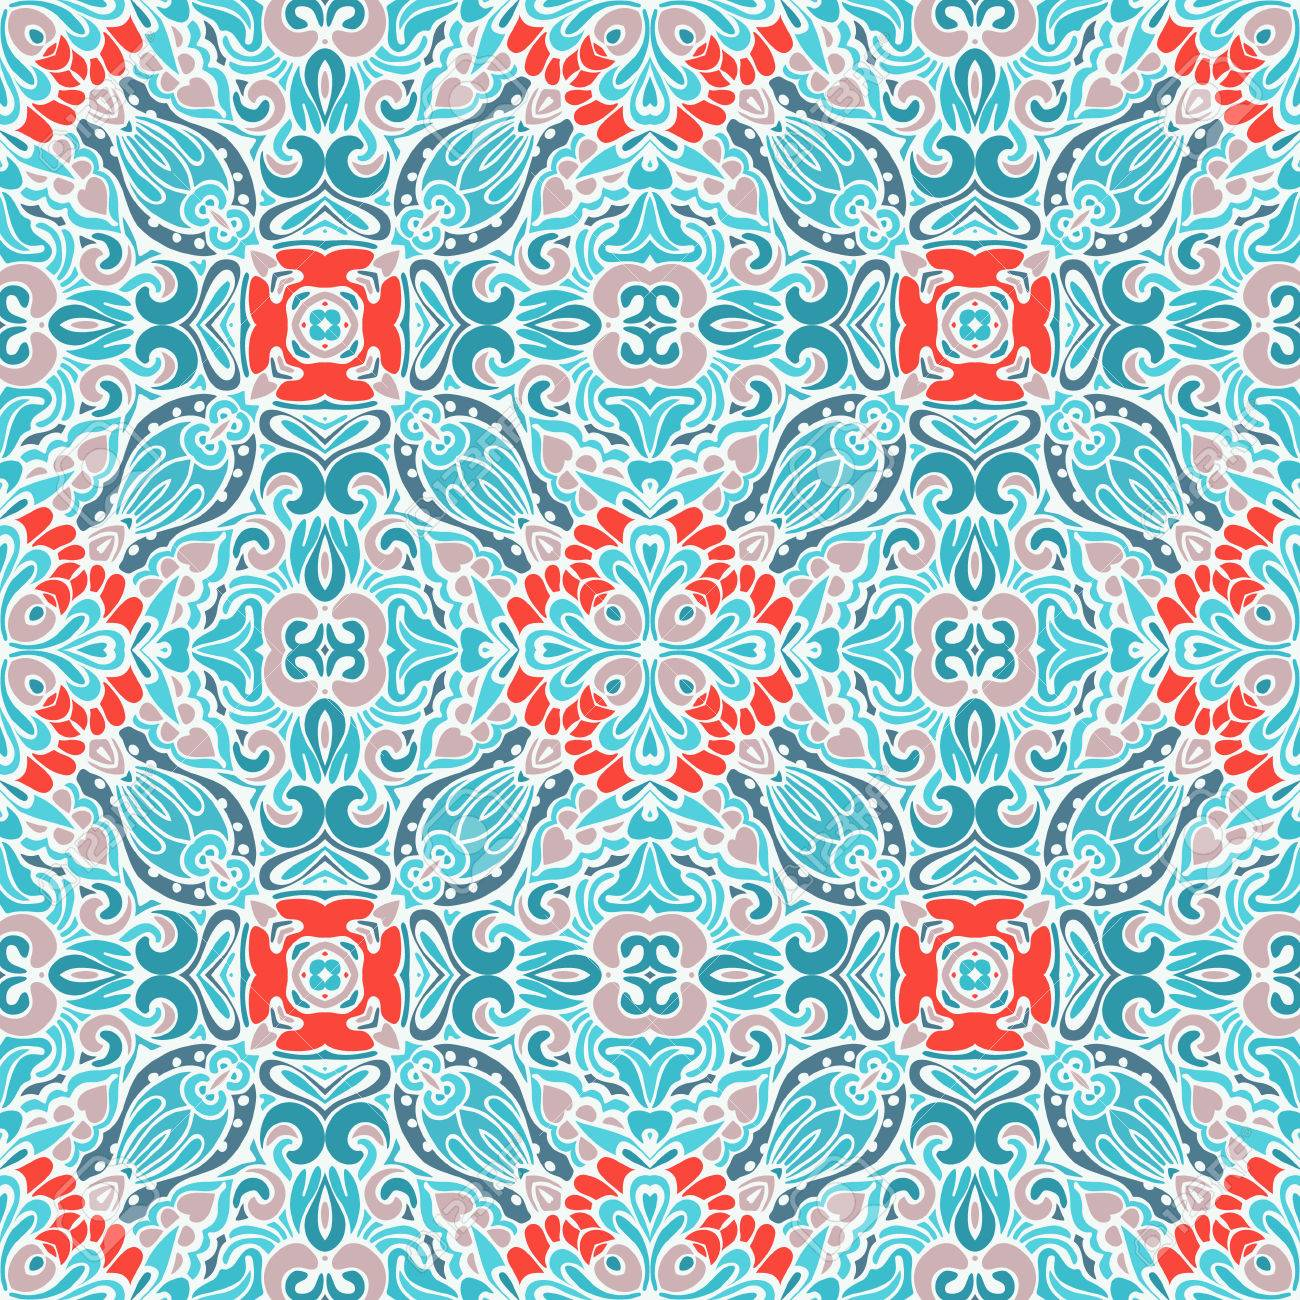 Christmas Gift Wrap Design.Winter Ornamental Background Design Christmas Gift Wrap Abstract